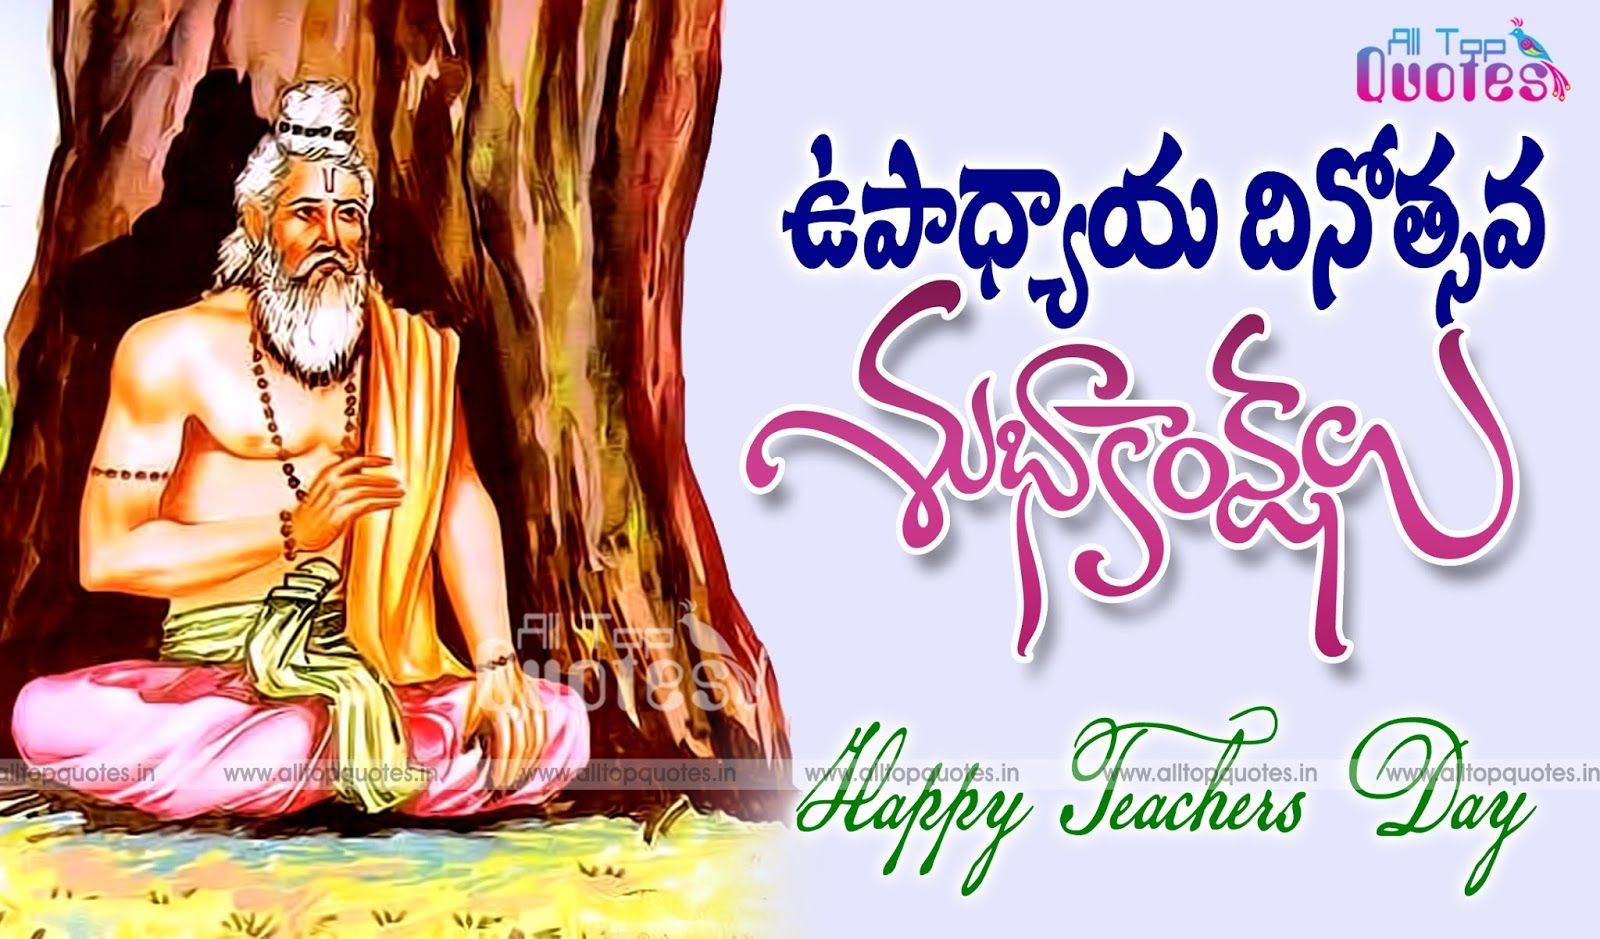 Here Is A Telugu Teachers Day Greetings Happy Teachers Day Greetings In Telugu Teachers Day Card Teachers Day Message Teachers Day Speech